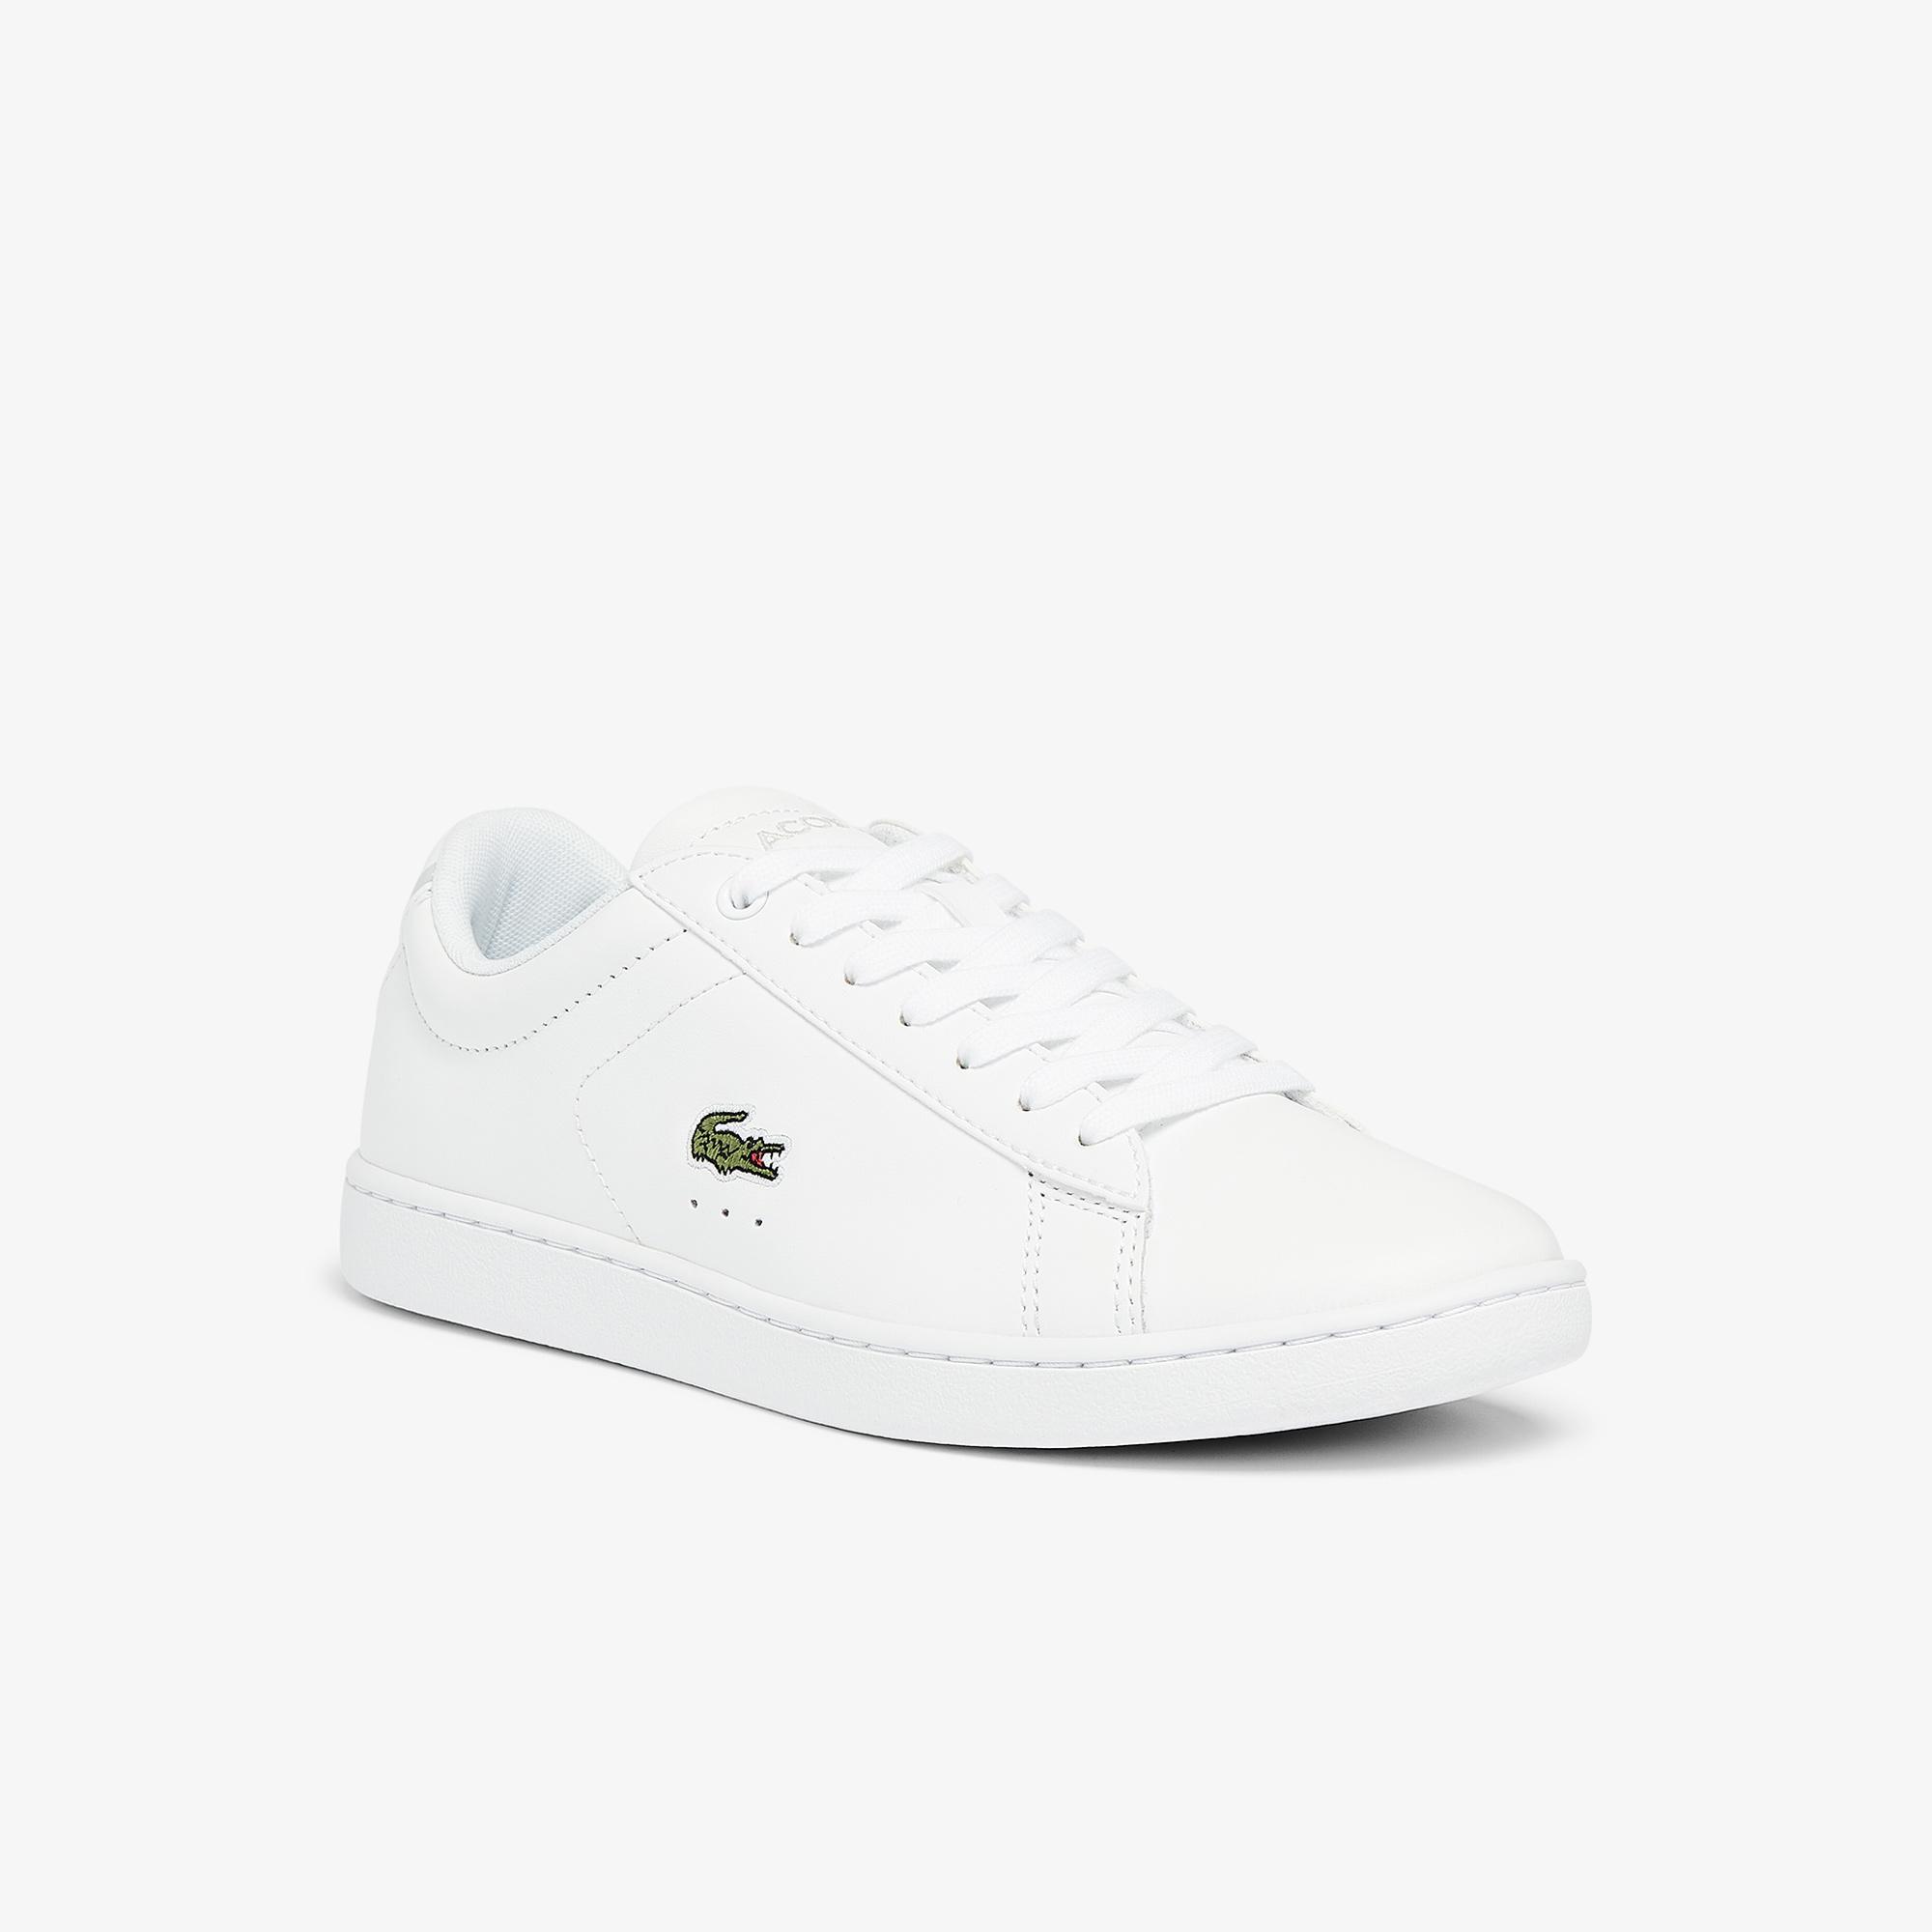 Lacoste Women's Carnaby Evo Bl 21 1 Sfa Shoes